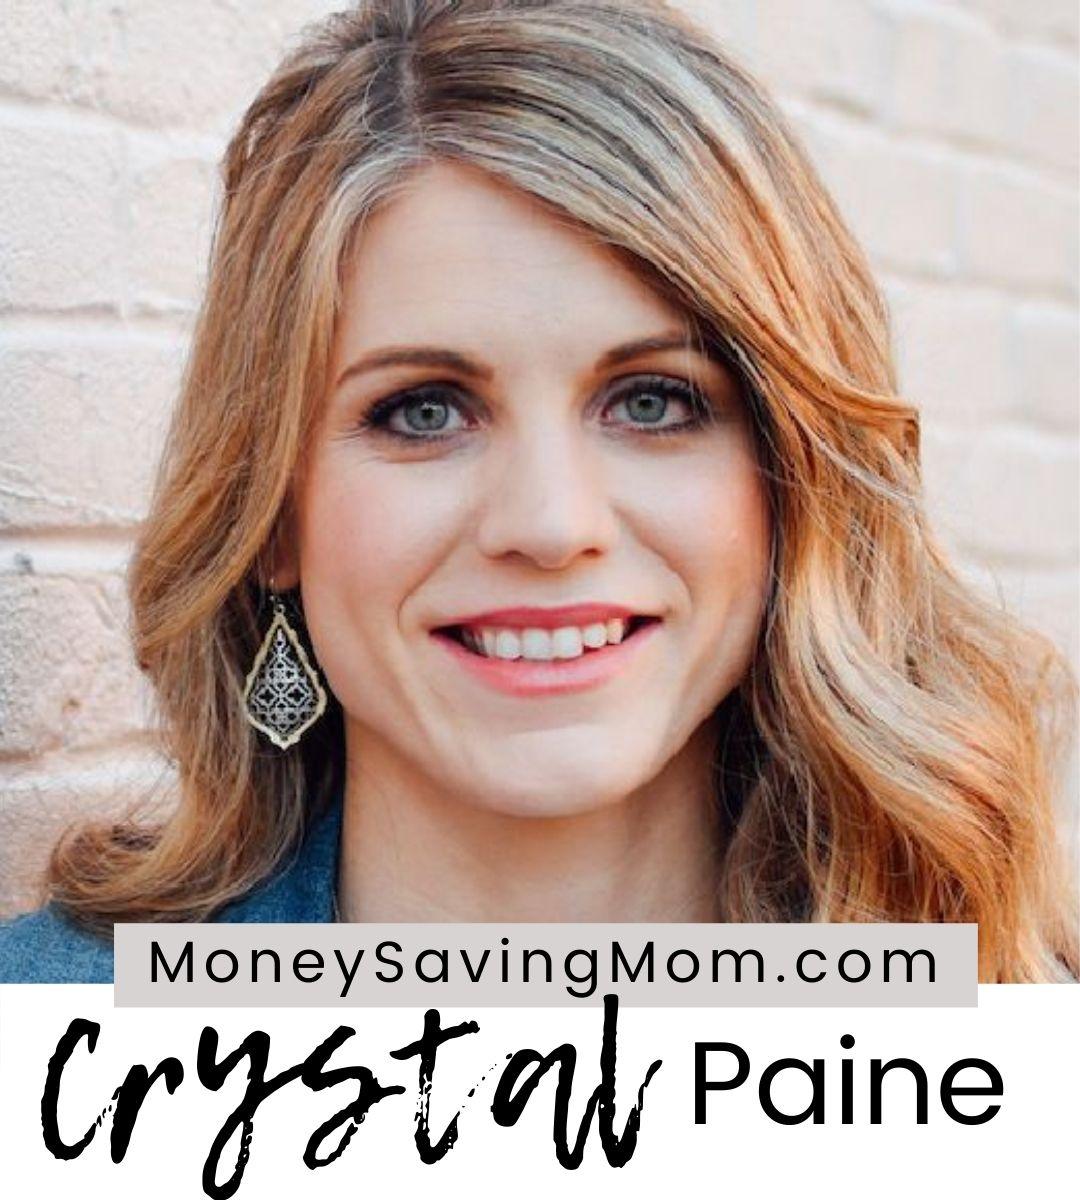 Crystal_Paine